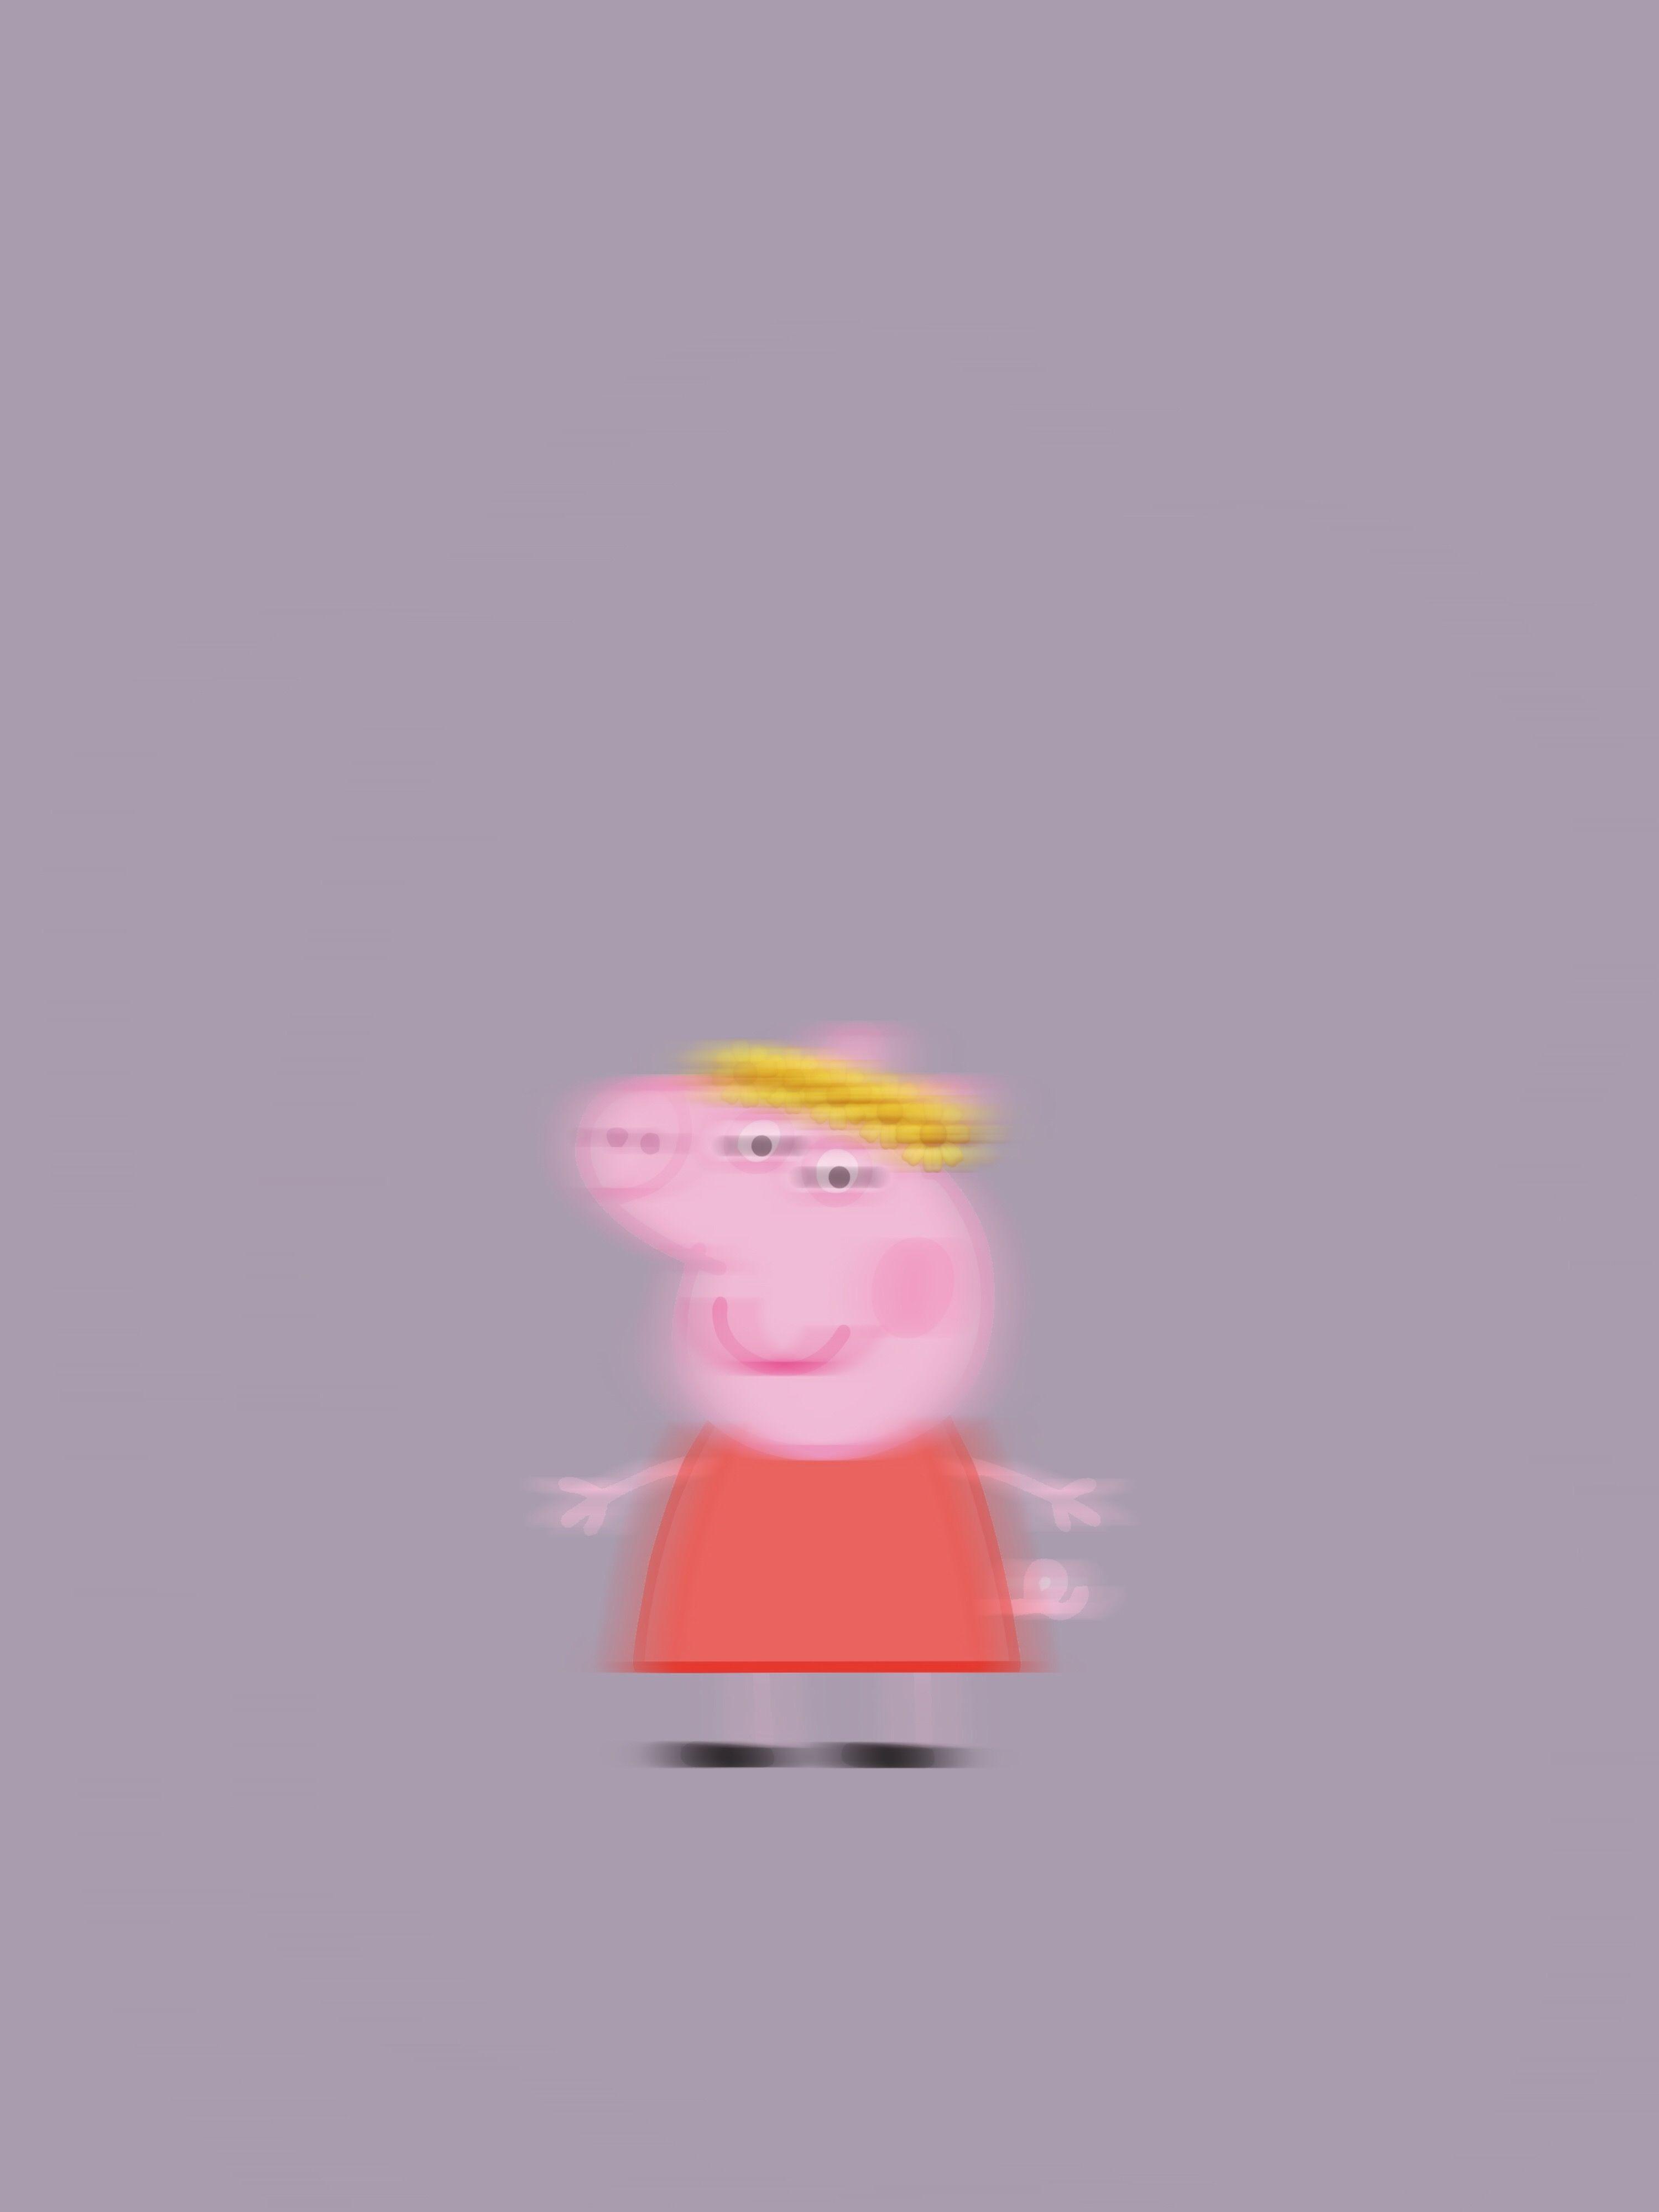 Peppa Pig Wallpaper Purple Sunflower Peppa Pig Wallpaper Pig Wallpaper Peppa Pig